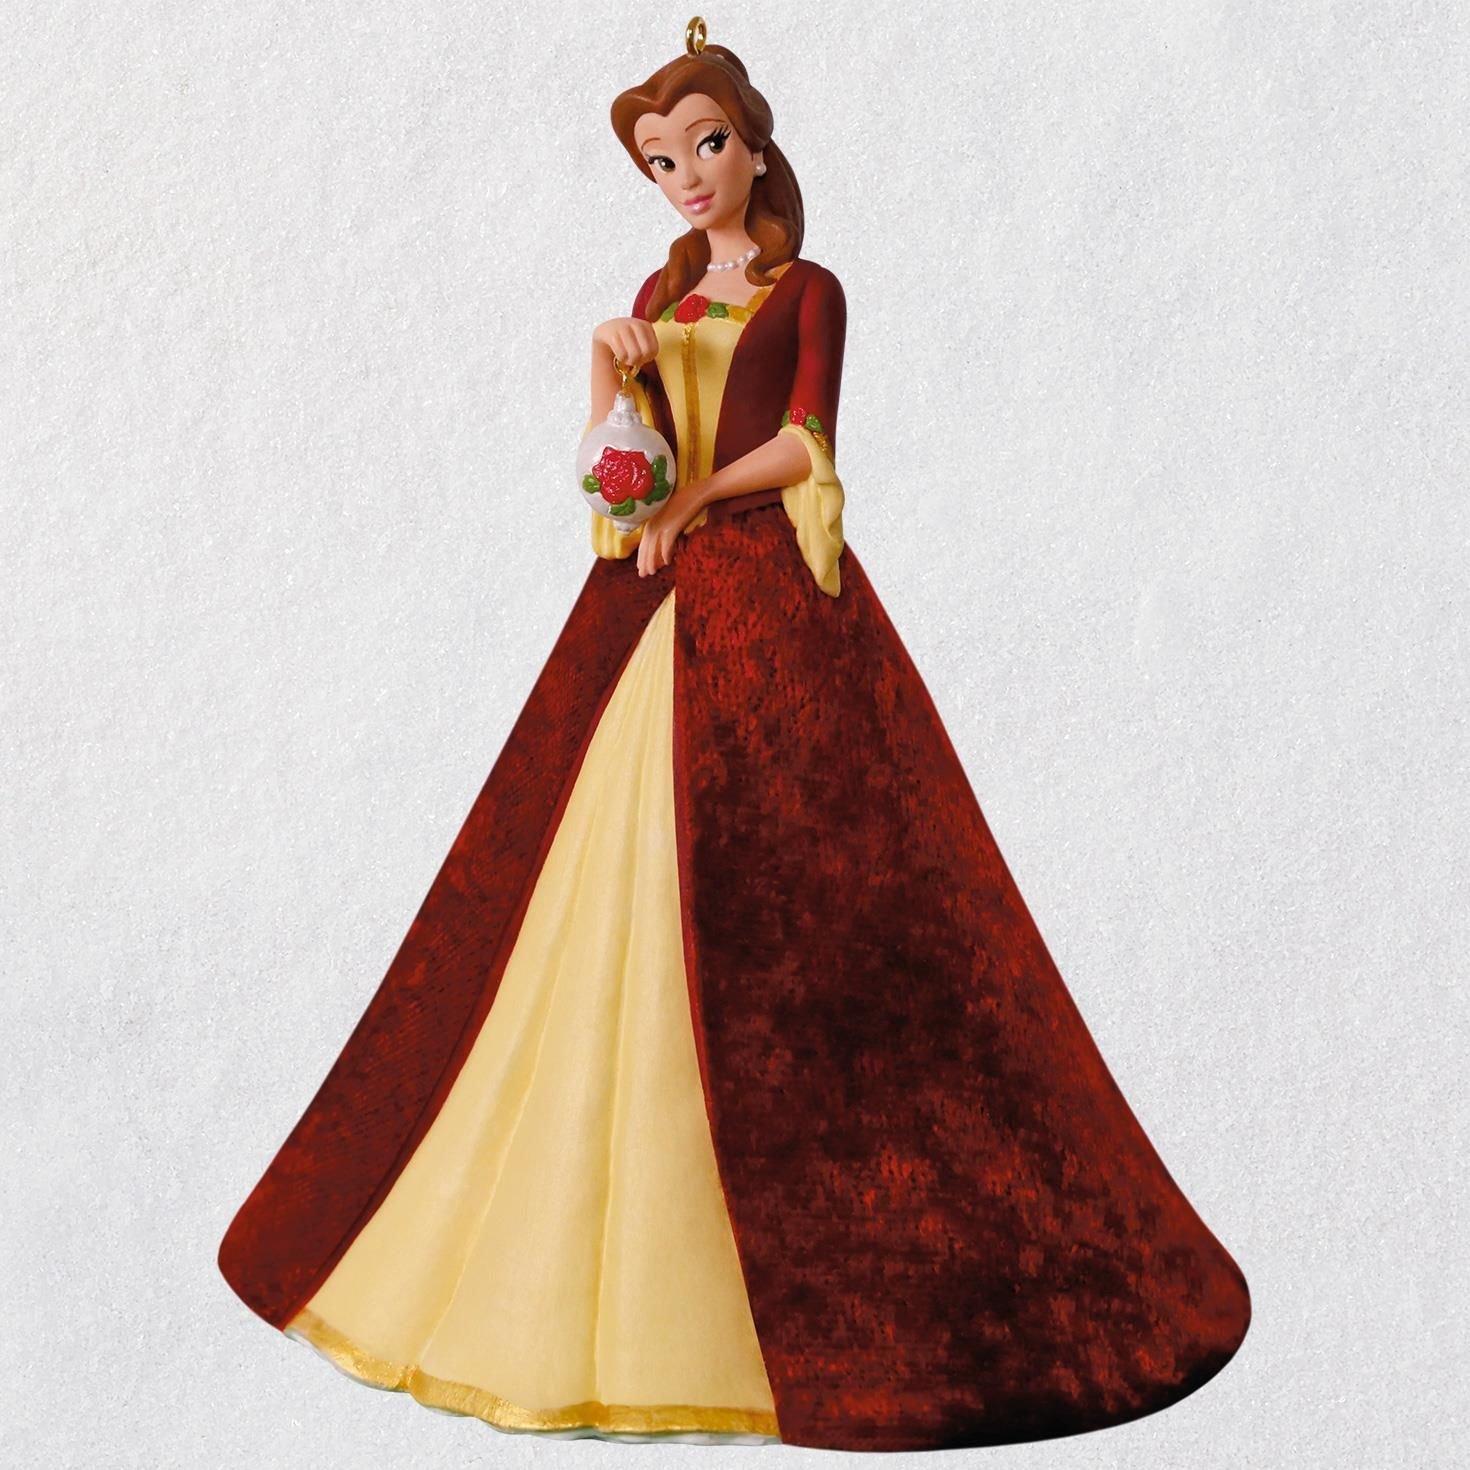 Hallmark Disney Beauty and the Beast Christmas Belle Porcelain Ornament keepsake-ornaments Movies & TV